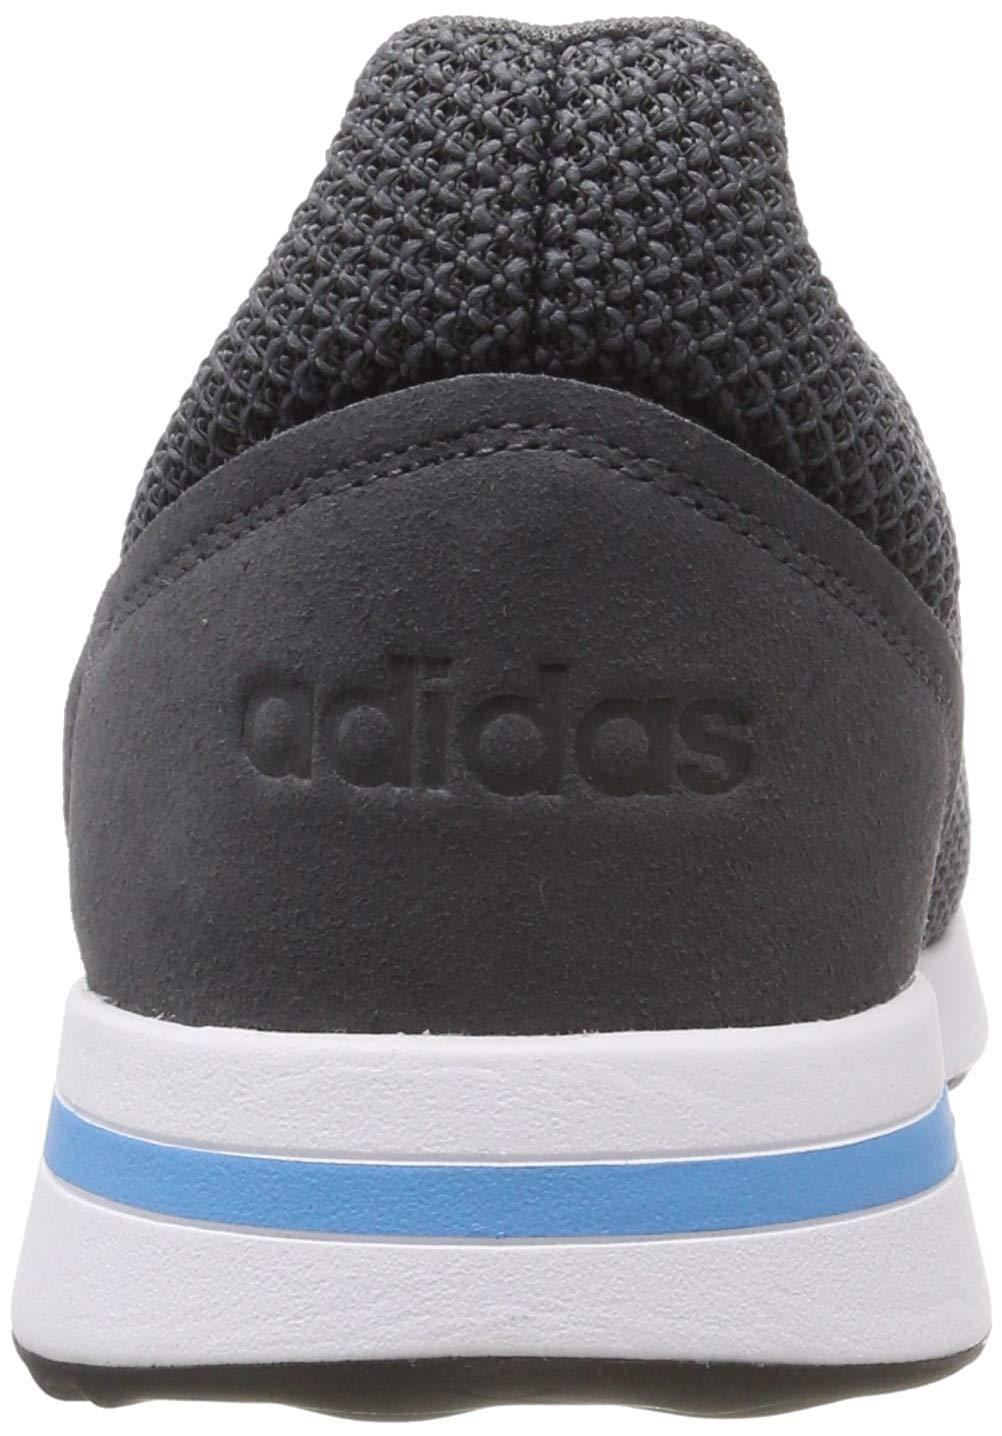 adidas Run70s, Scarpe da Running Uomo 12 spesavip